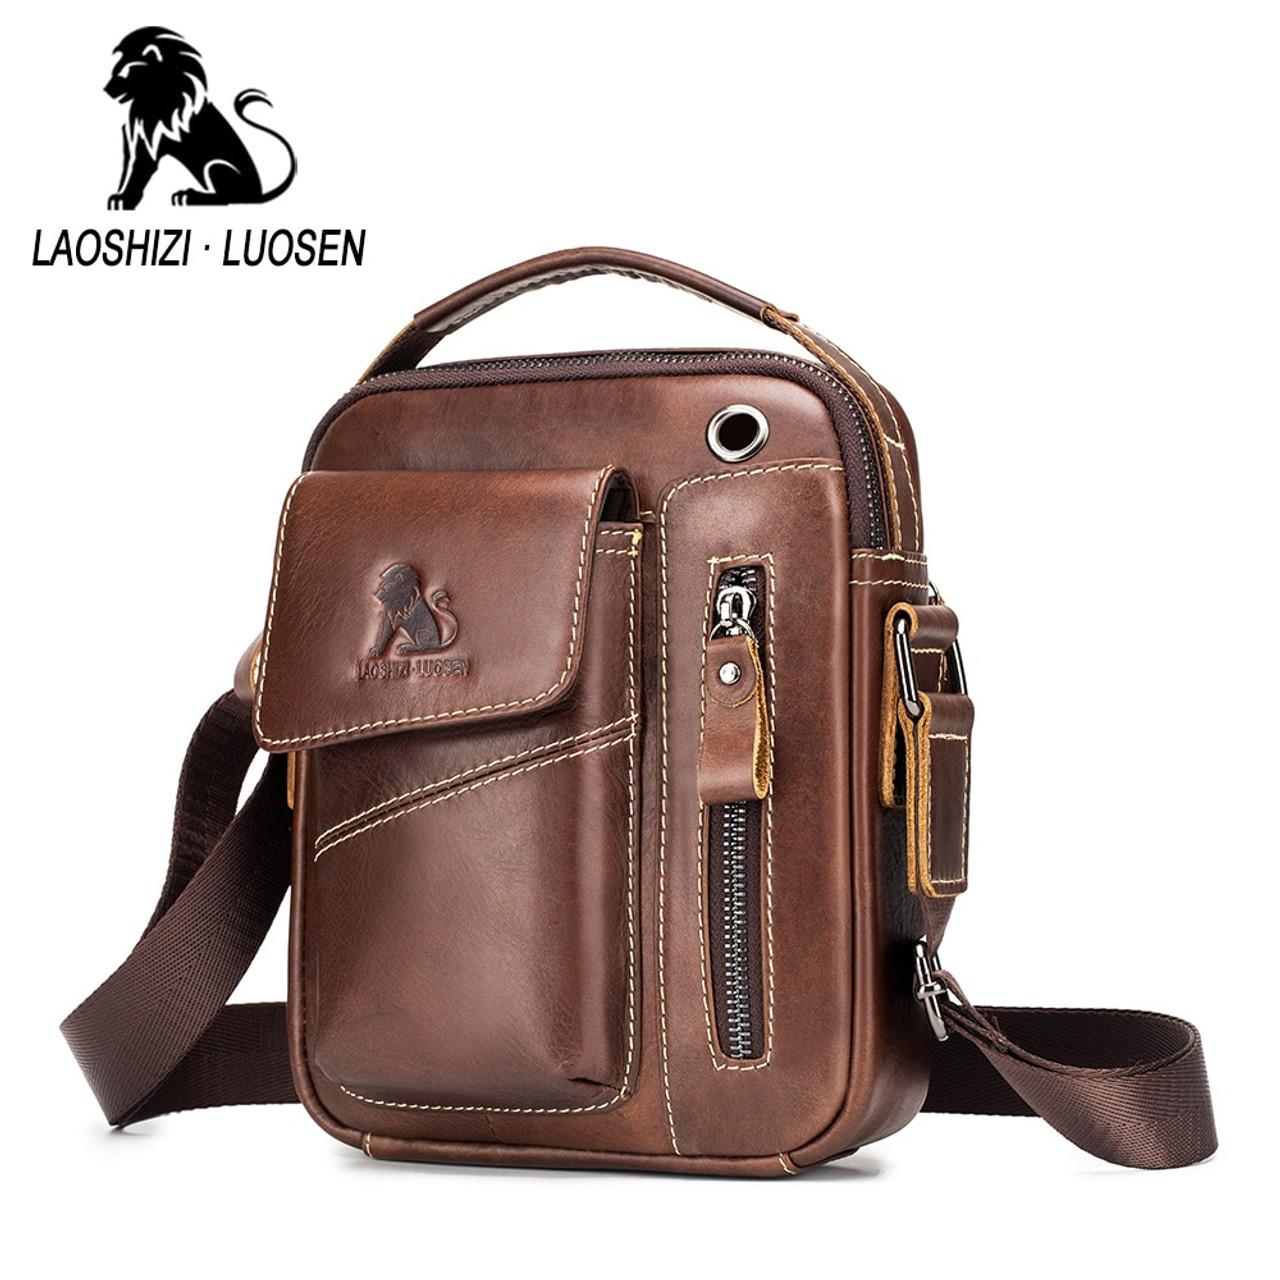 Leather Men Crossbody Shoulder Bag Small Messenger Male Tote Man Handbag Casual